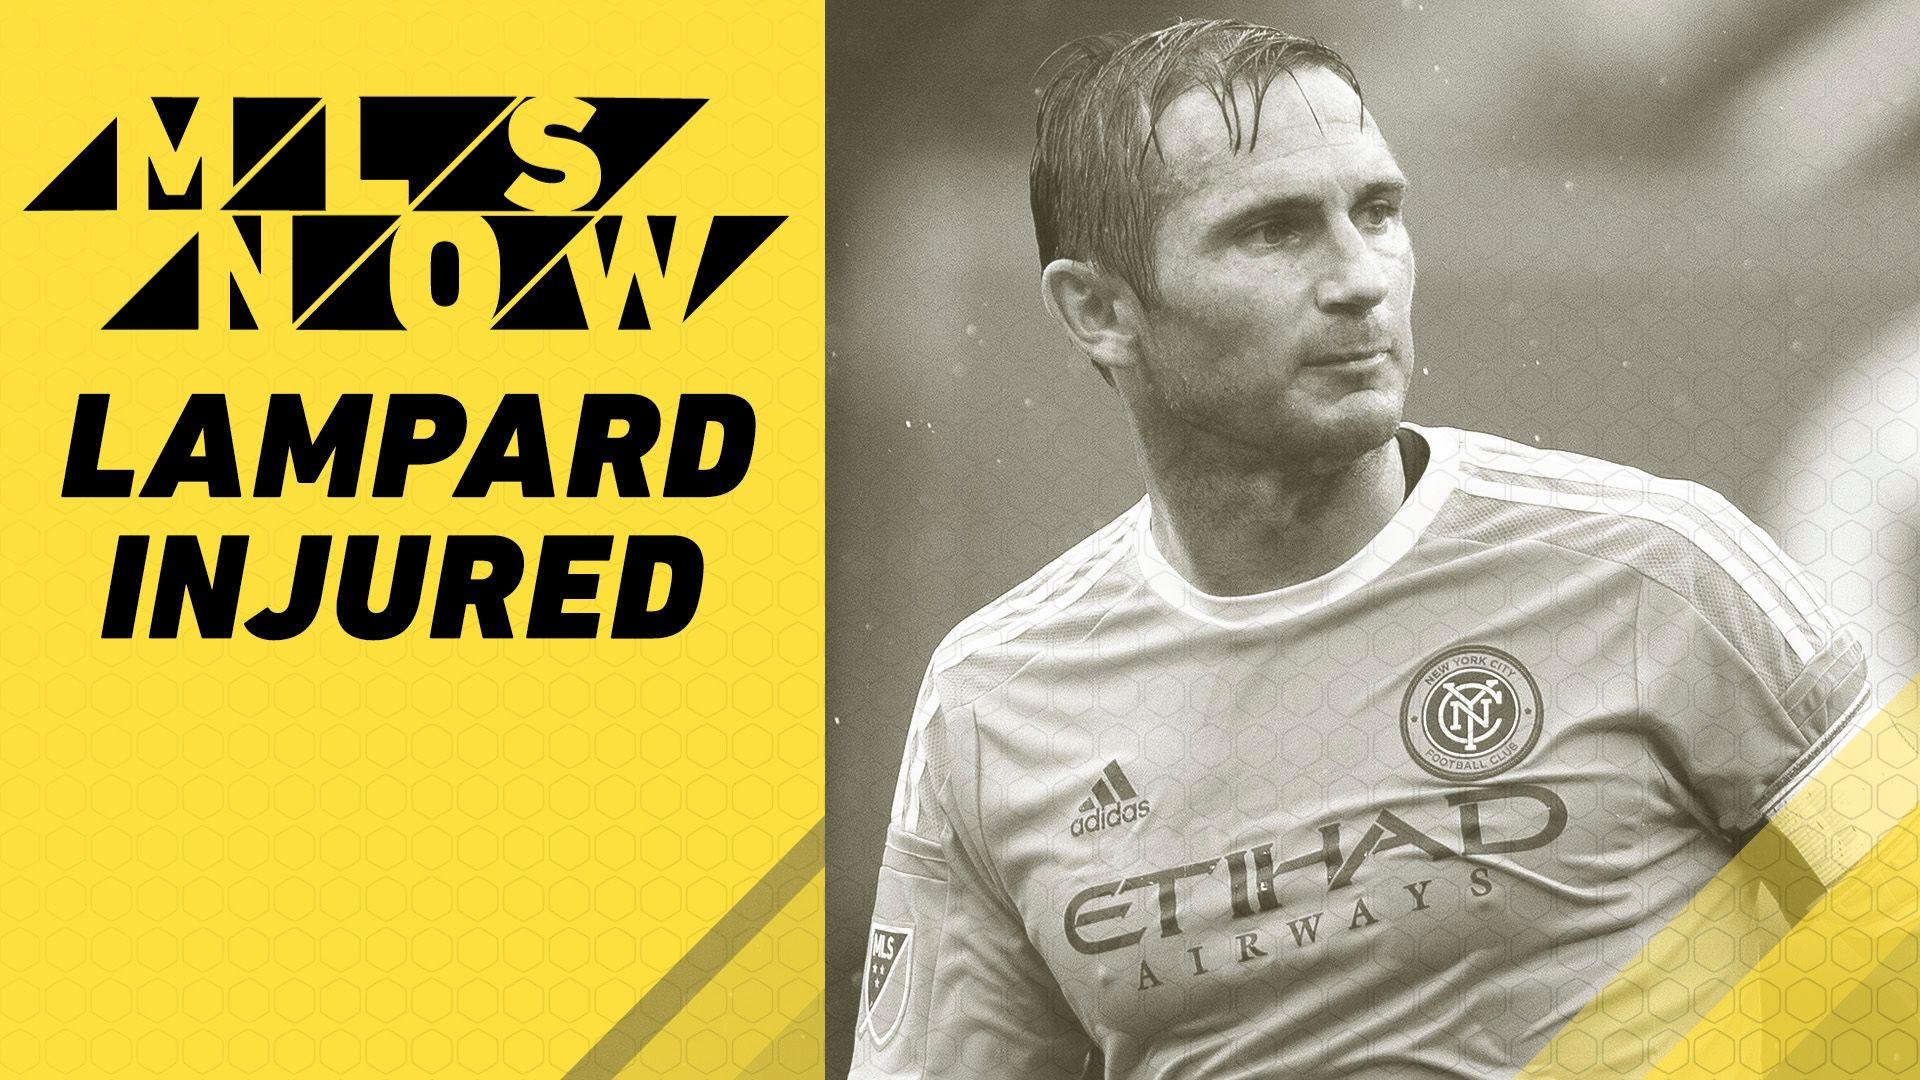 Video via MLS: Assessing Lampard's injury